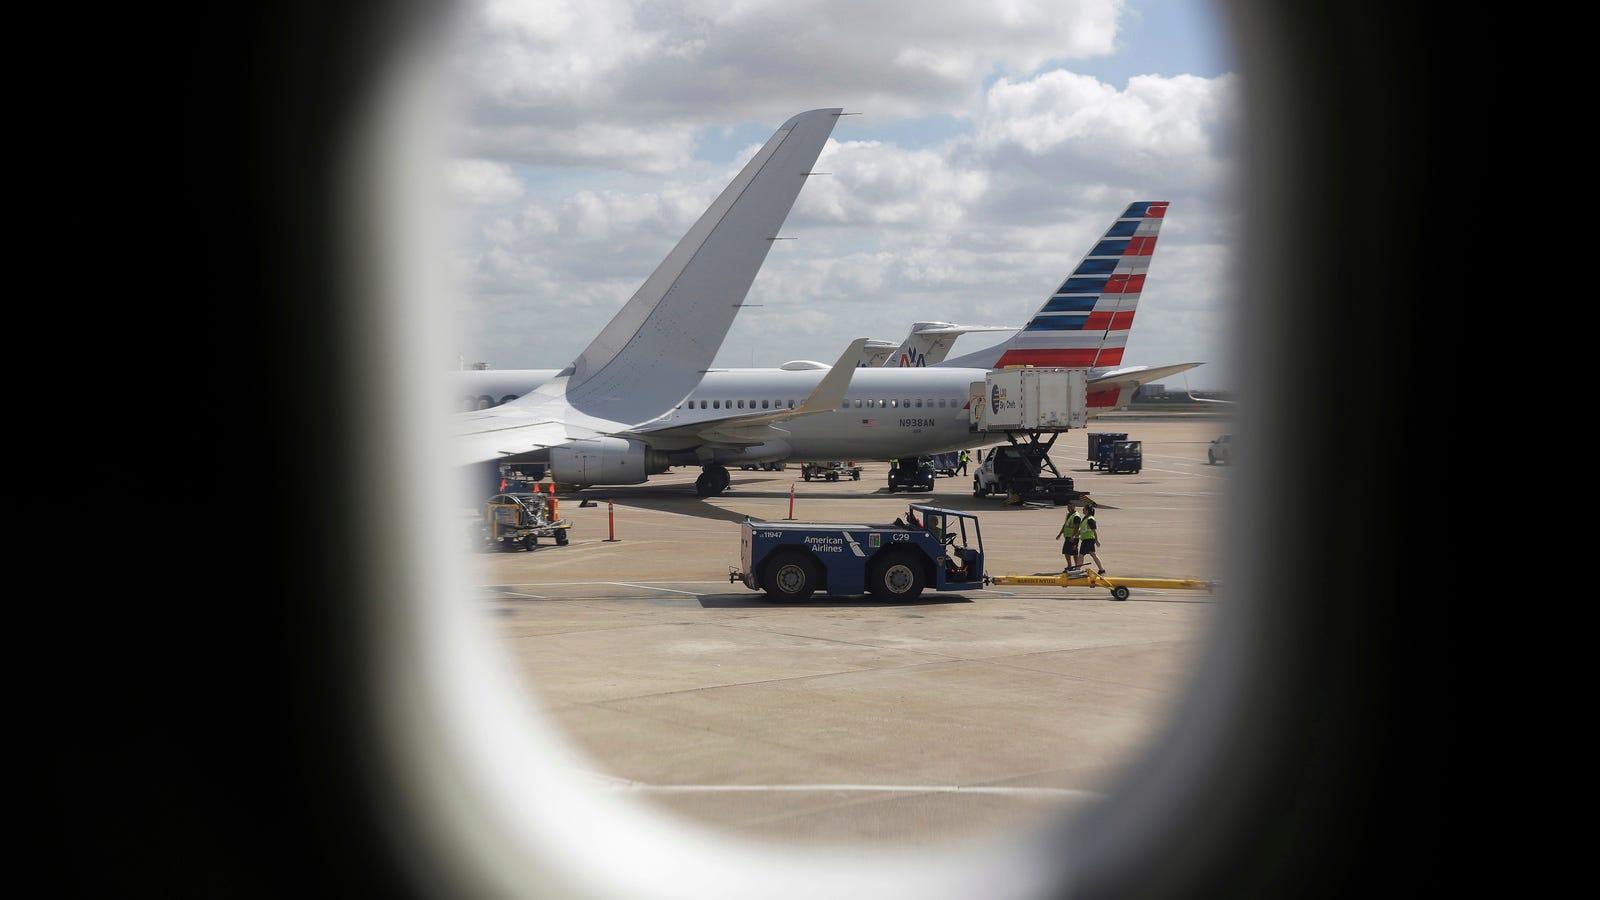 photo image FBI Warns of 'Alarming' Increase in In-Flight Sexual Assaults